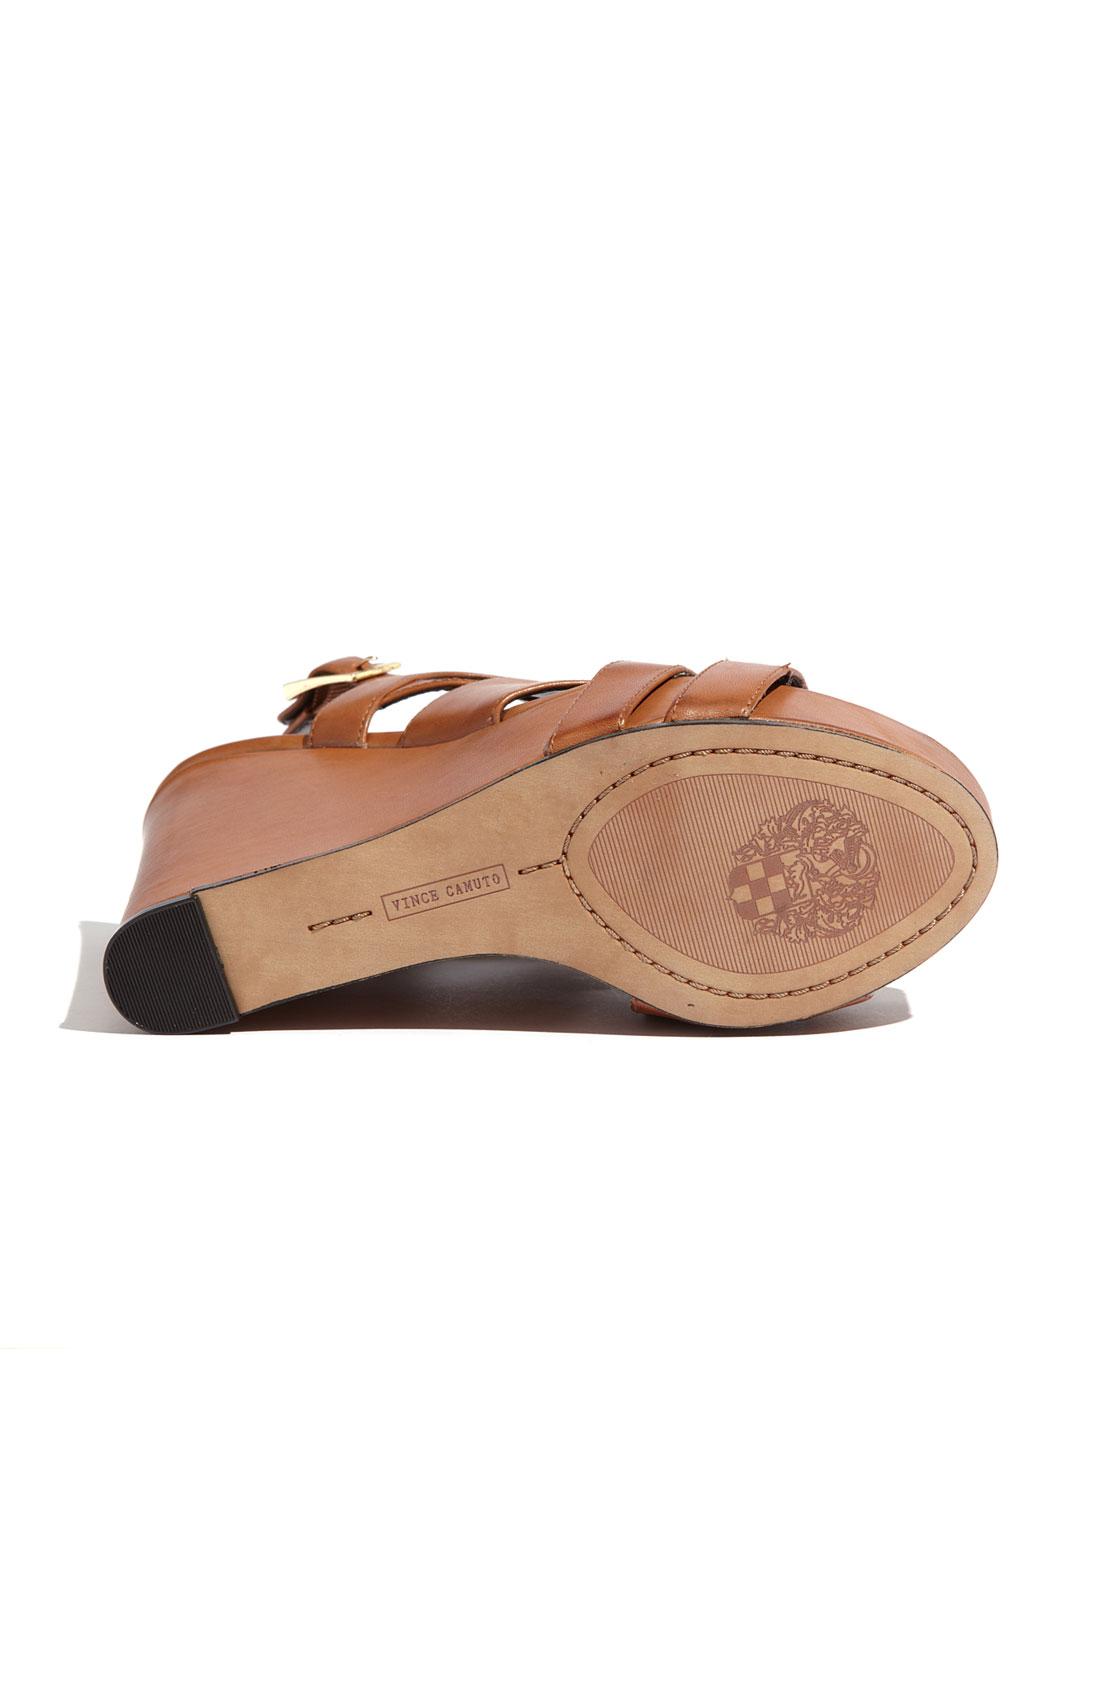 Vince Camuto Shivona Wedge Sandals In Brown Fudge Lyst